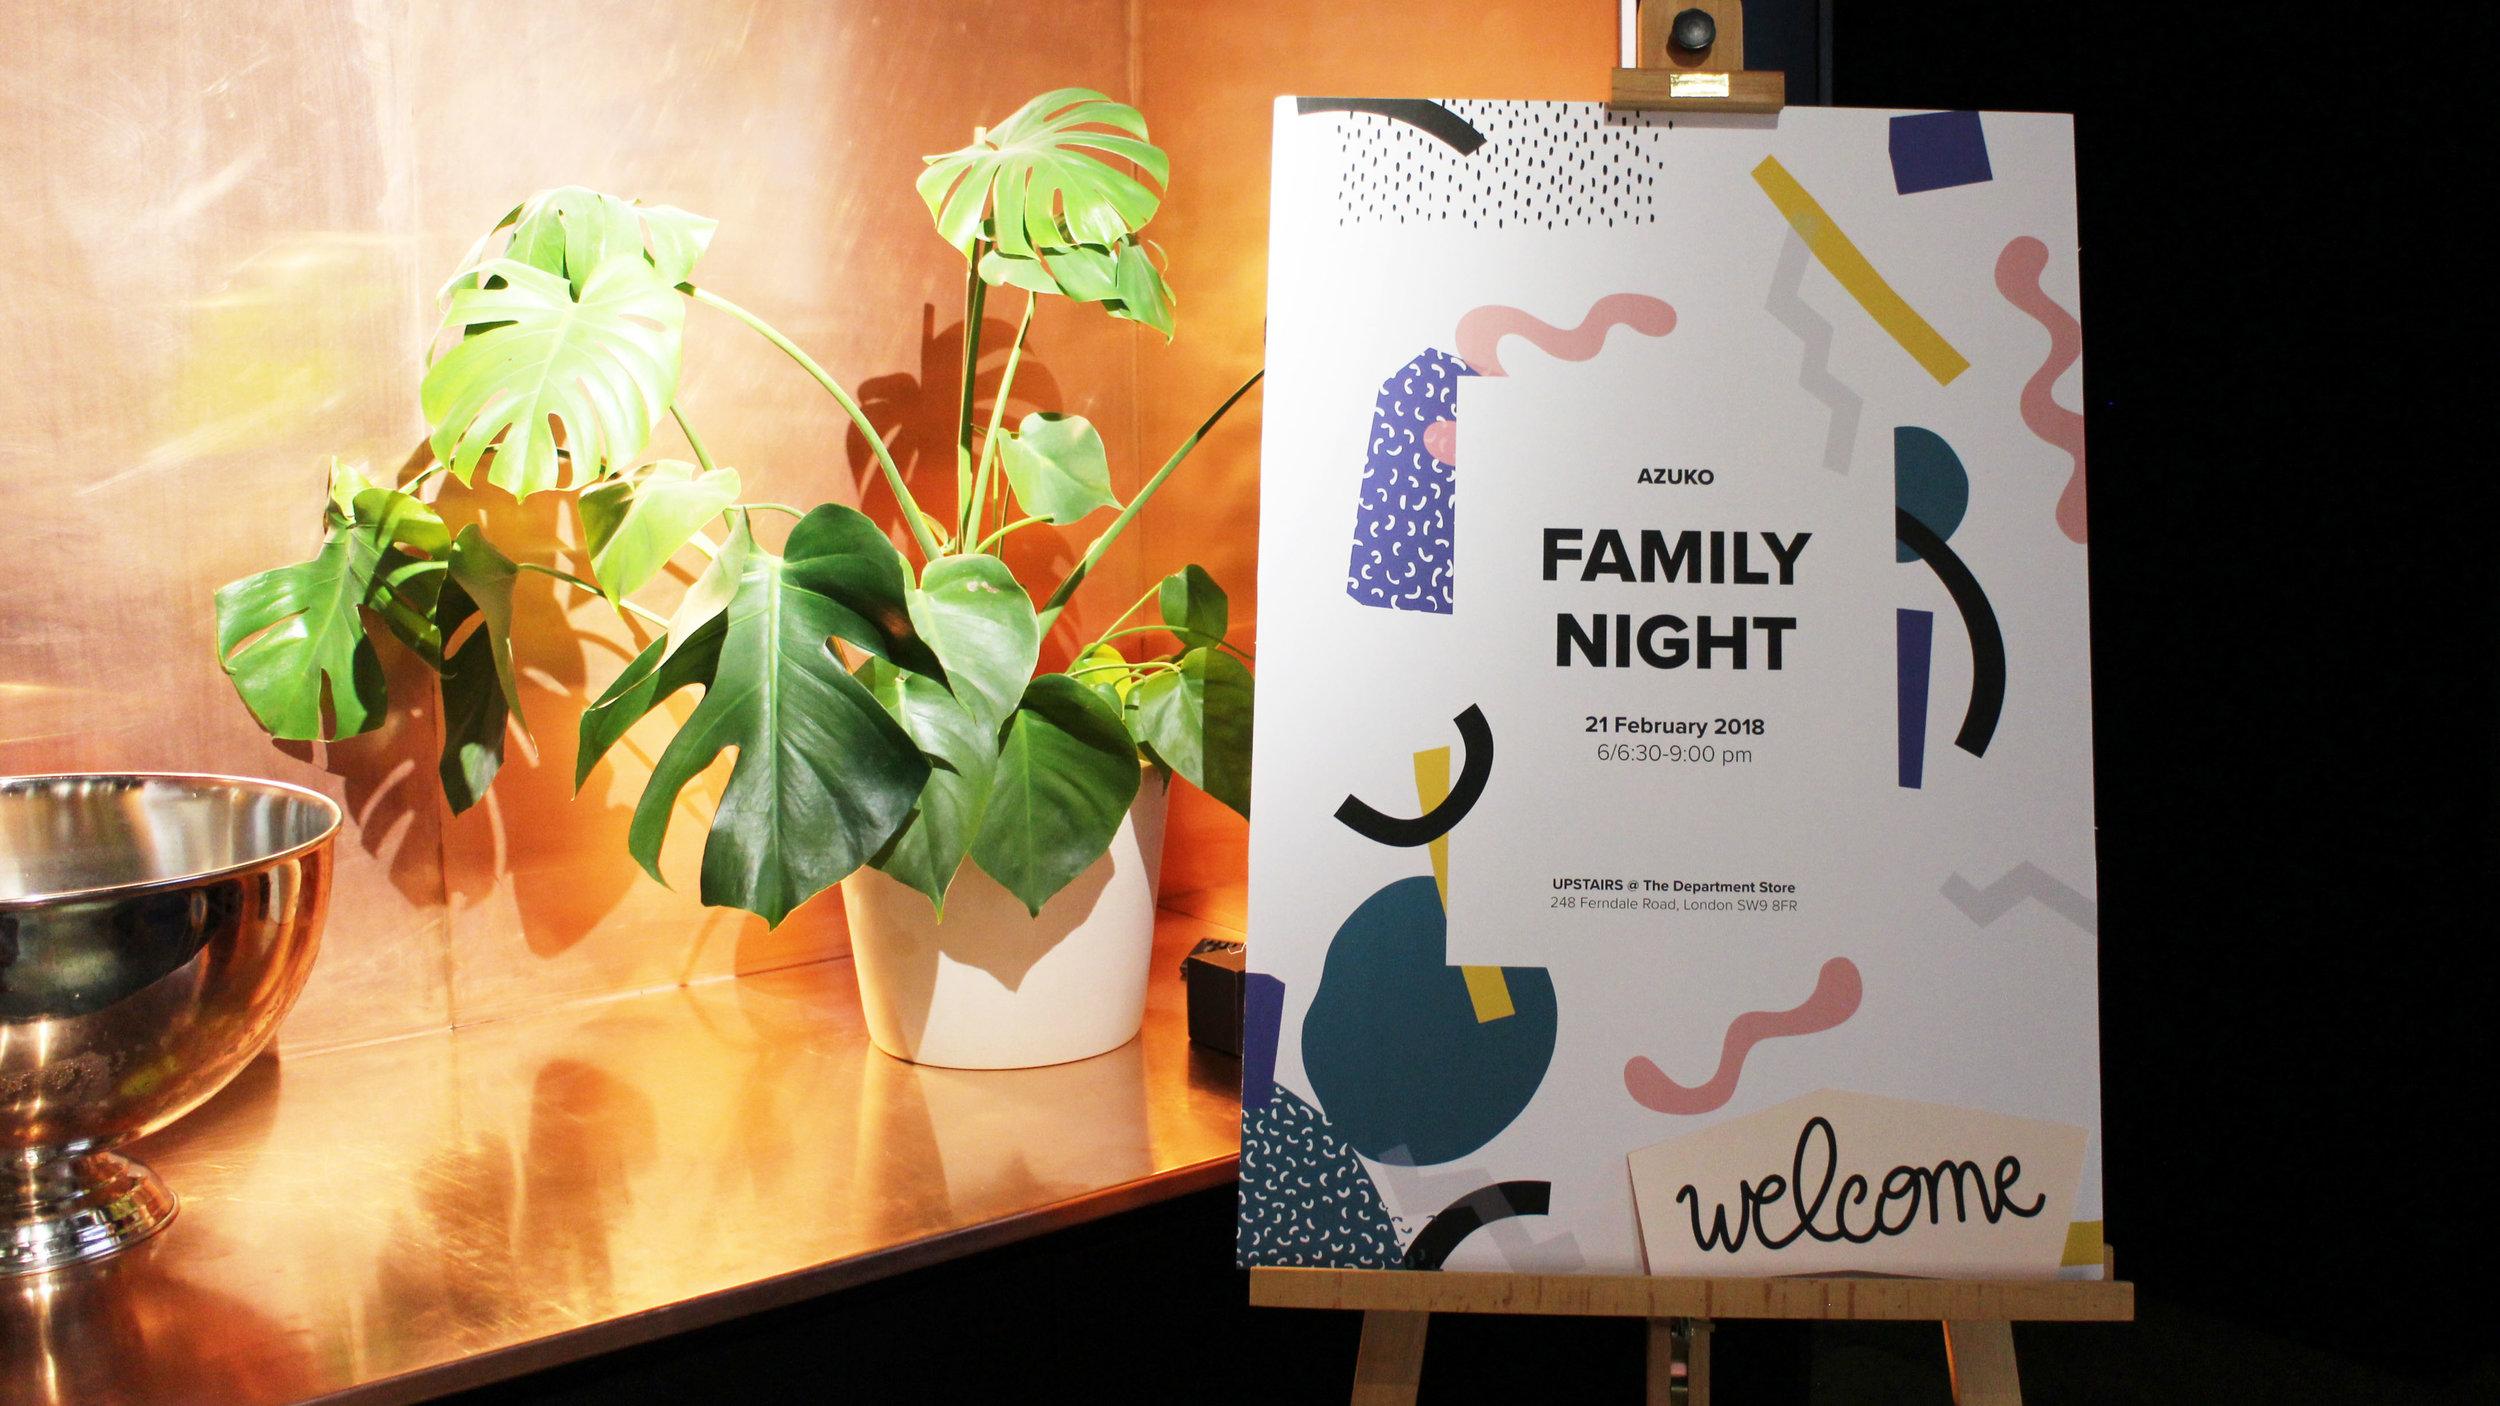 Welcome to AzuKo Family Night 2018